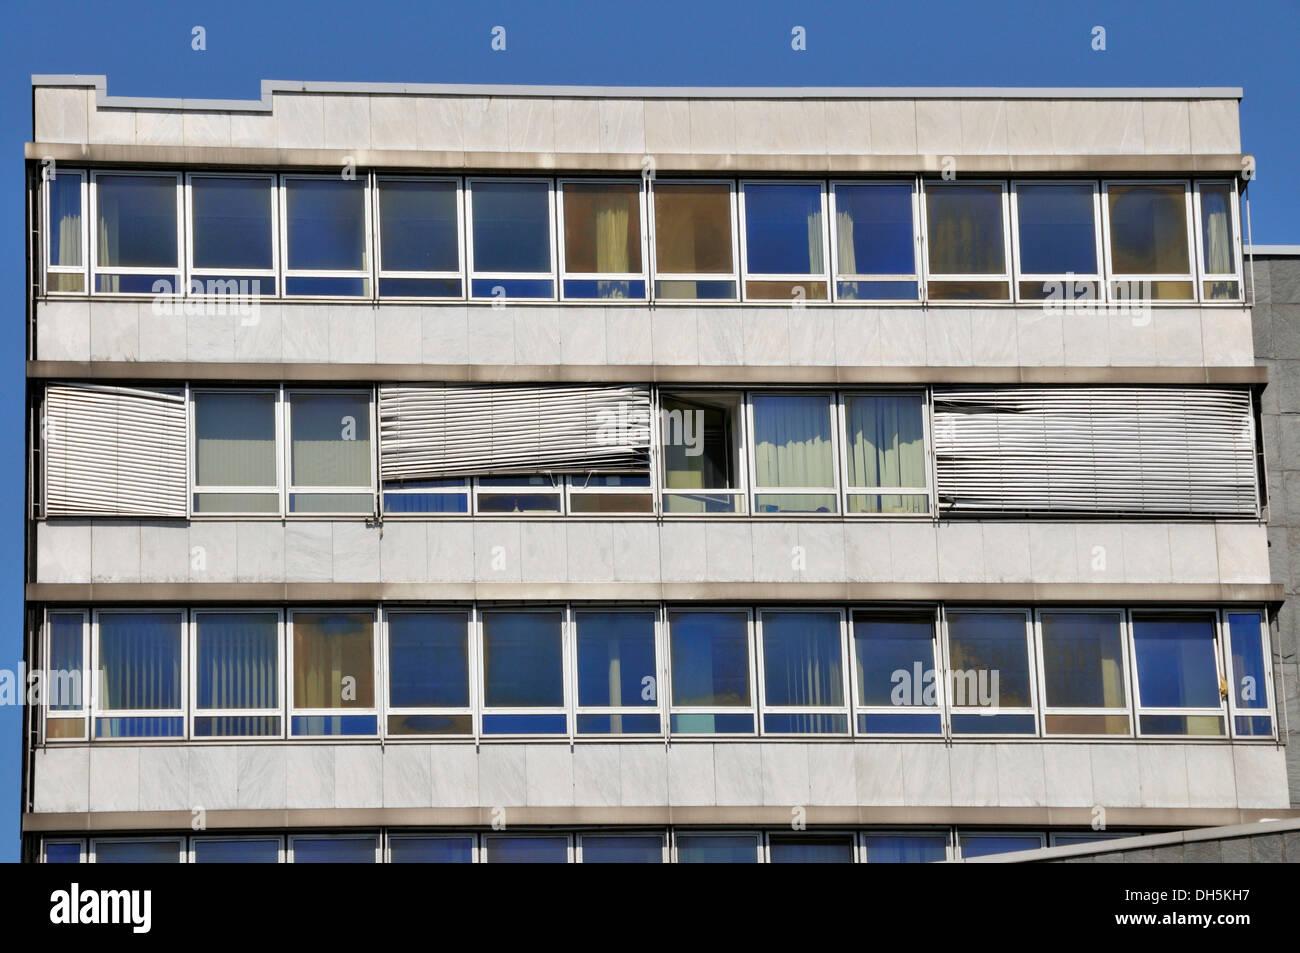 Venetian Architecture Run Down Office Building With Broken Blinds Mainz Stock